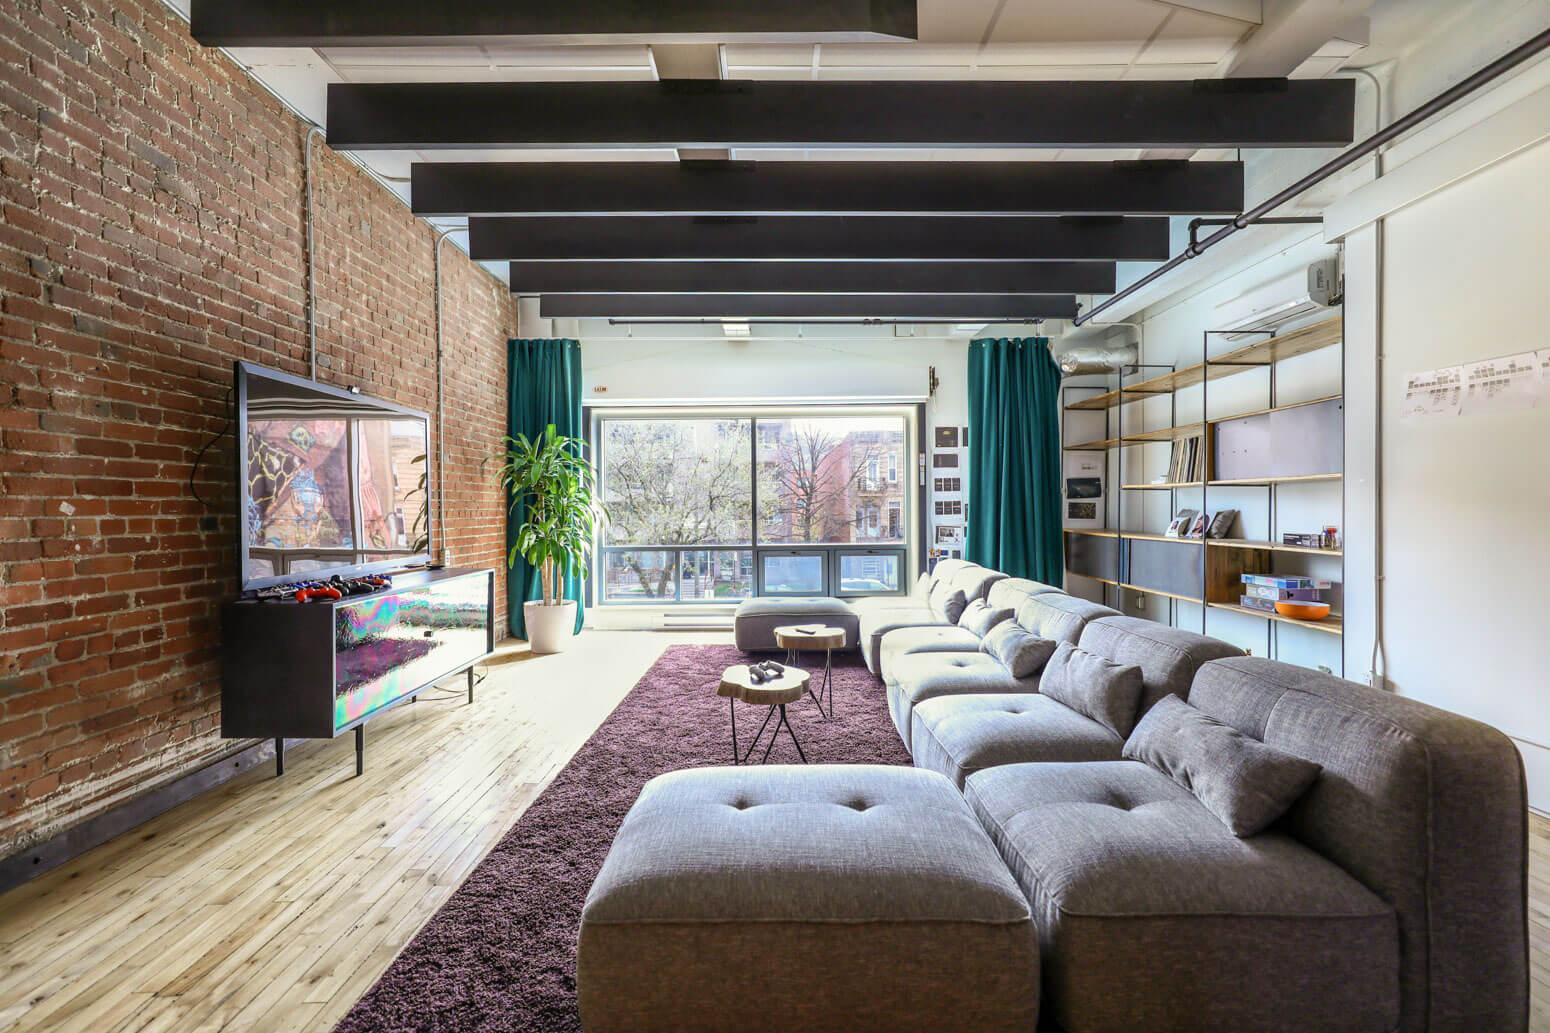 Shutterstock Montreal Office Killer Spaces-20